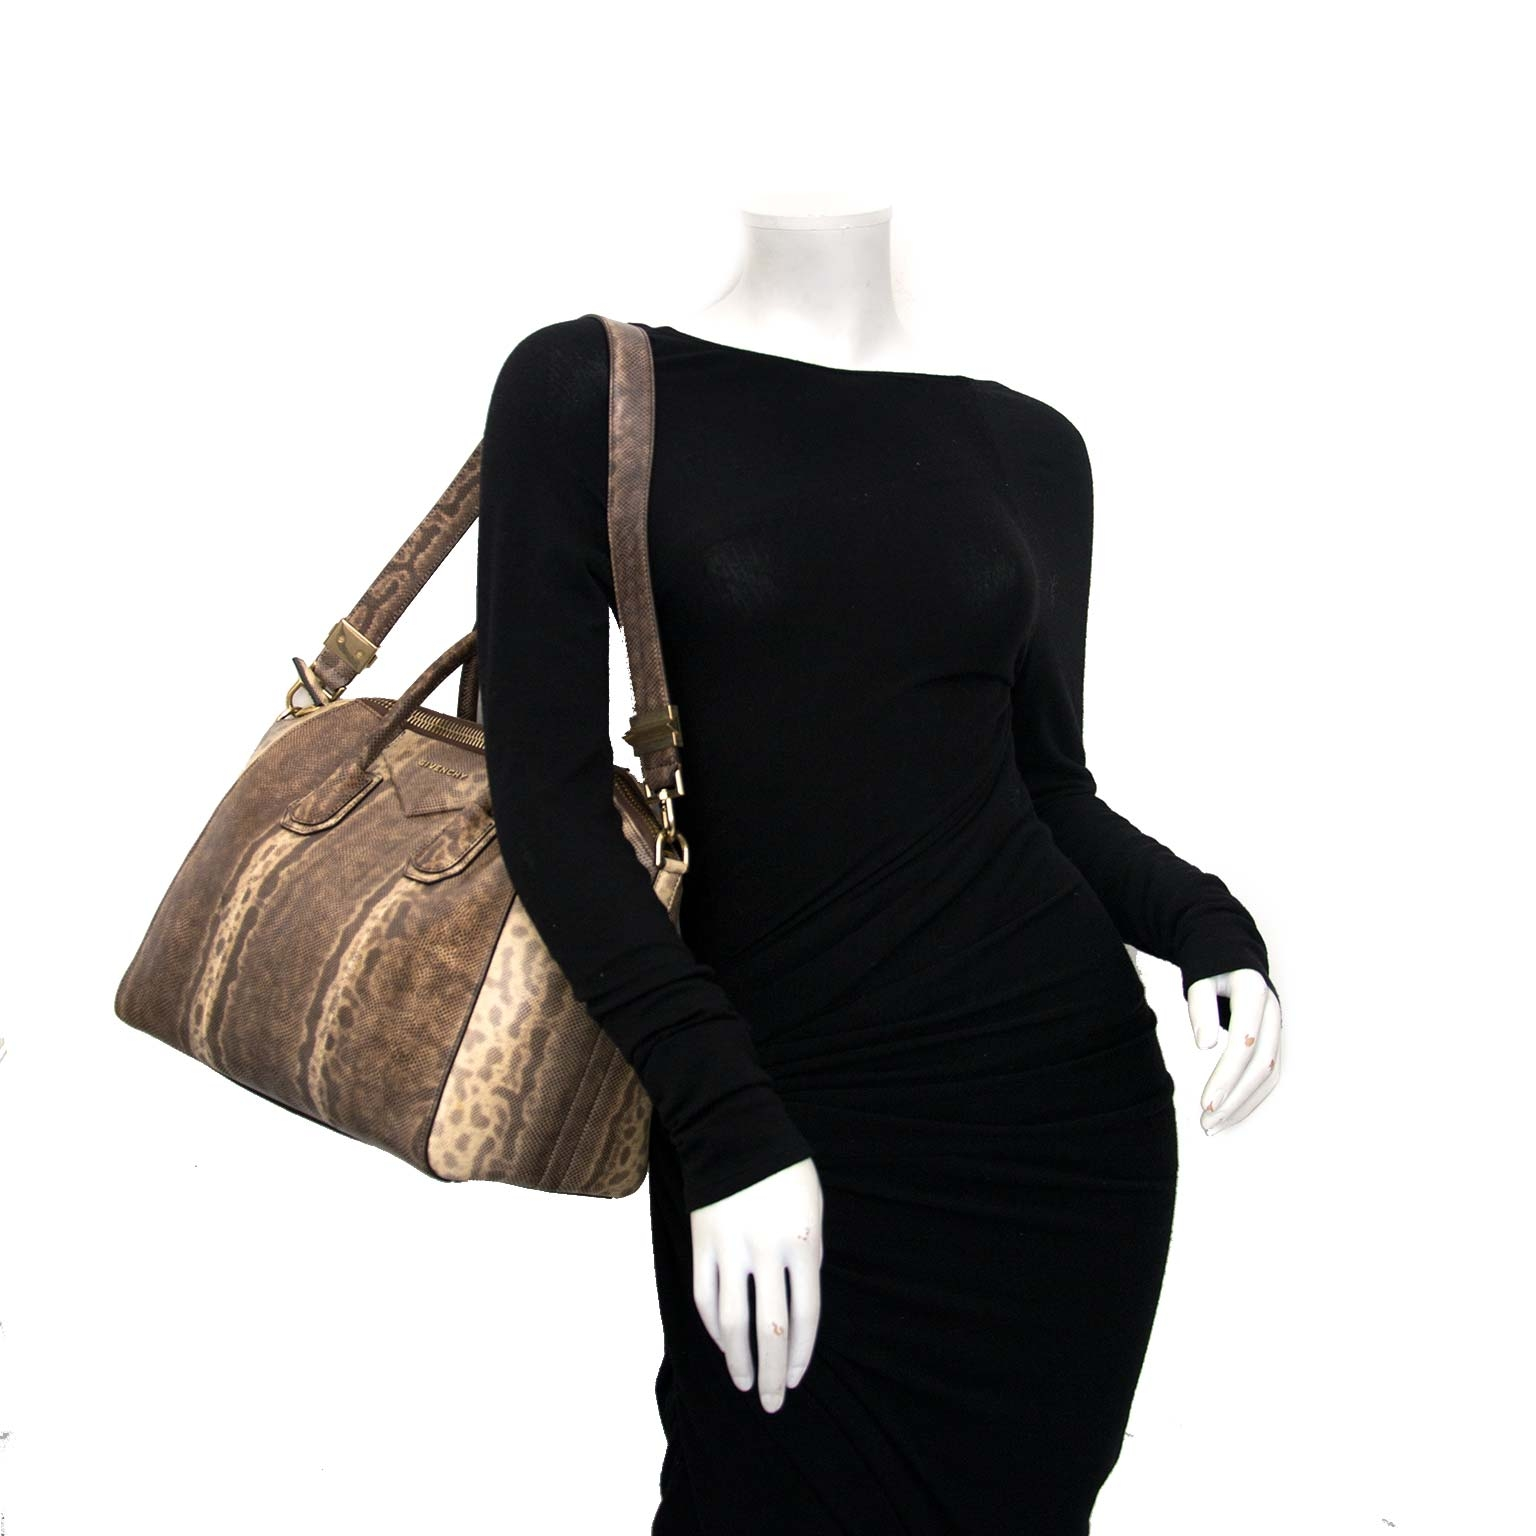 Givenchy Antigona Medium Brown Snakeskin Tote Bag